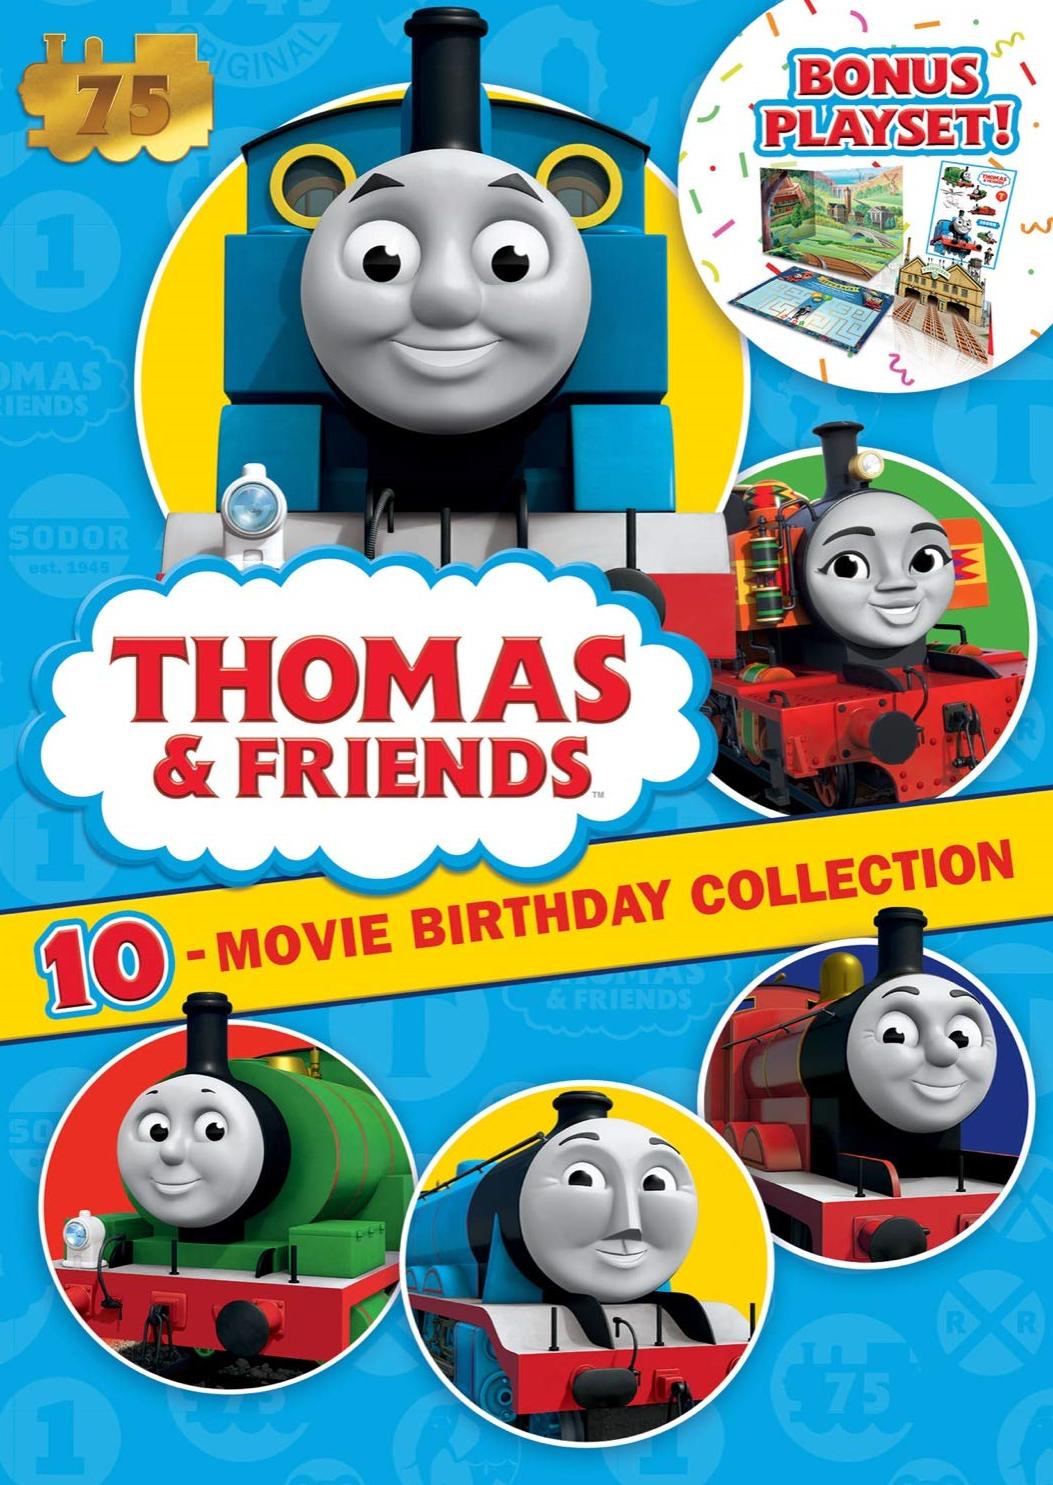 10-Movie Birthday Collection